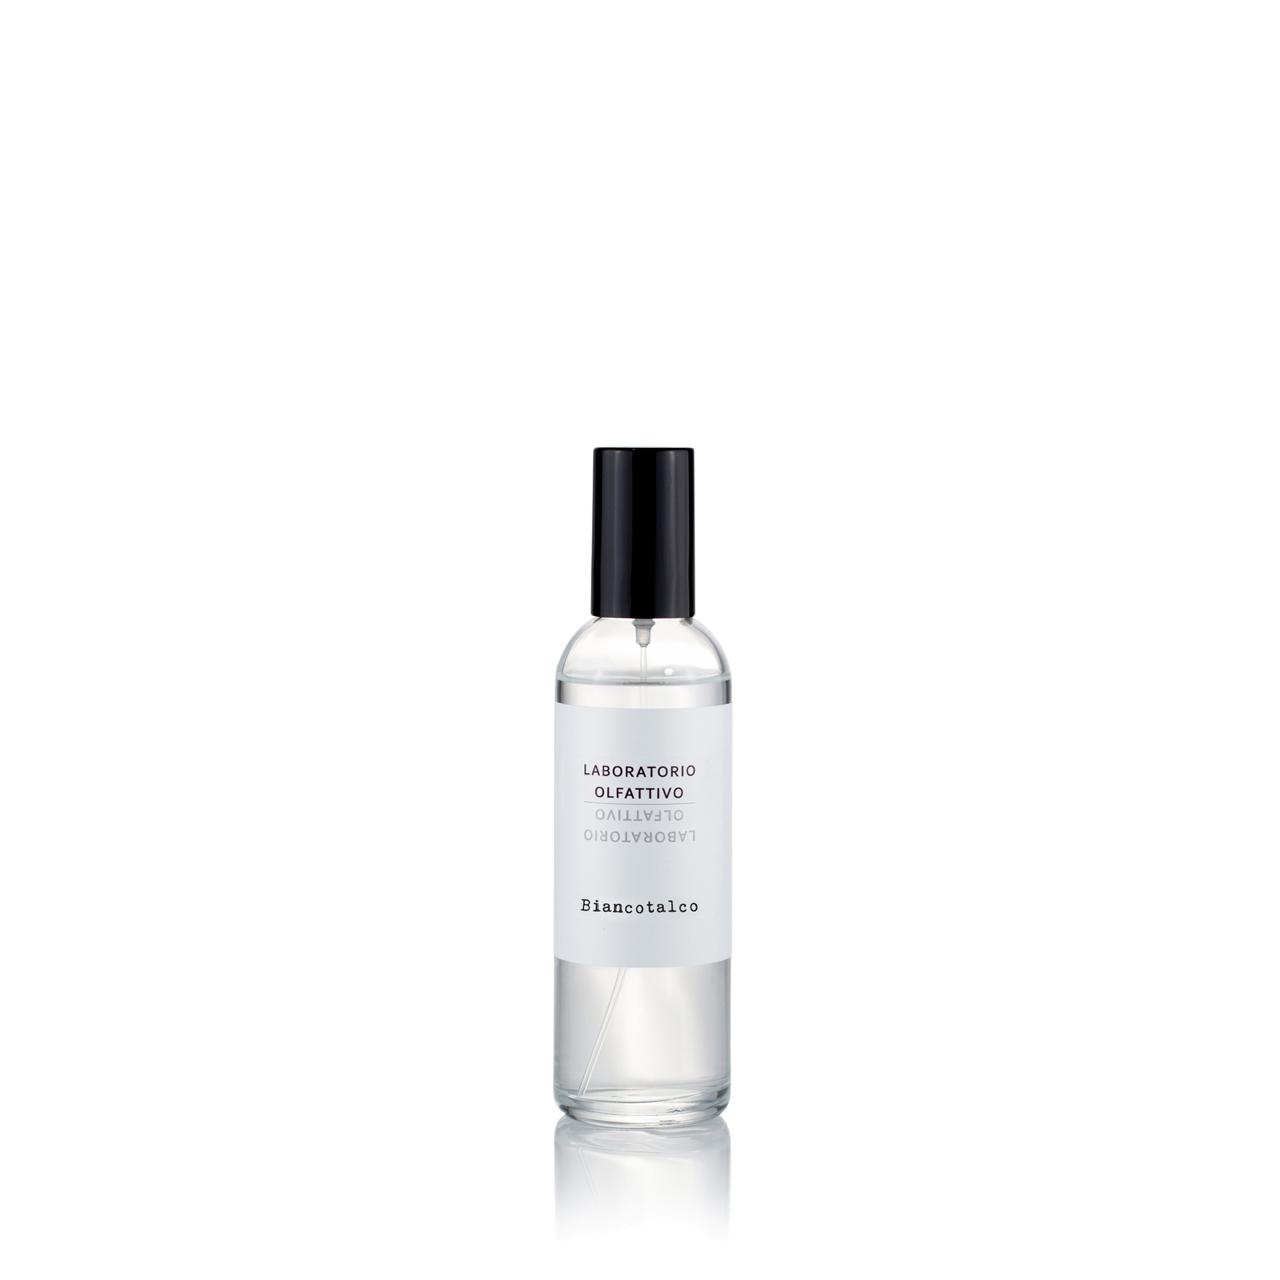 Biancotalco - Room Fragrance